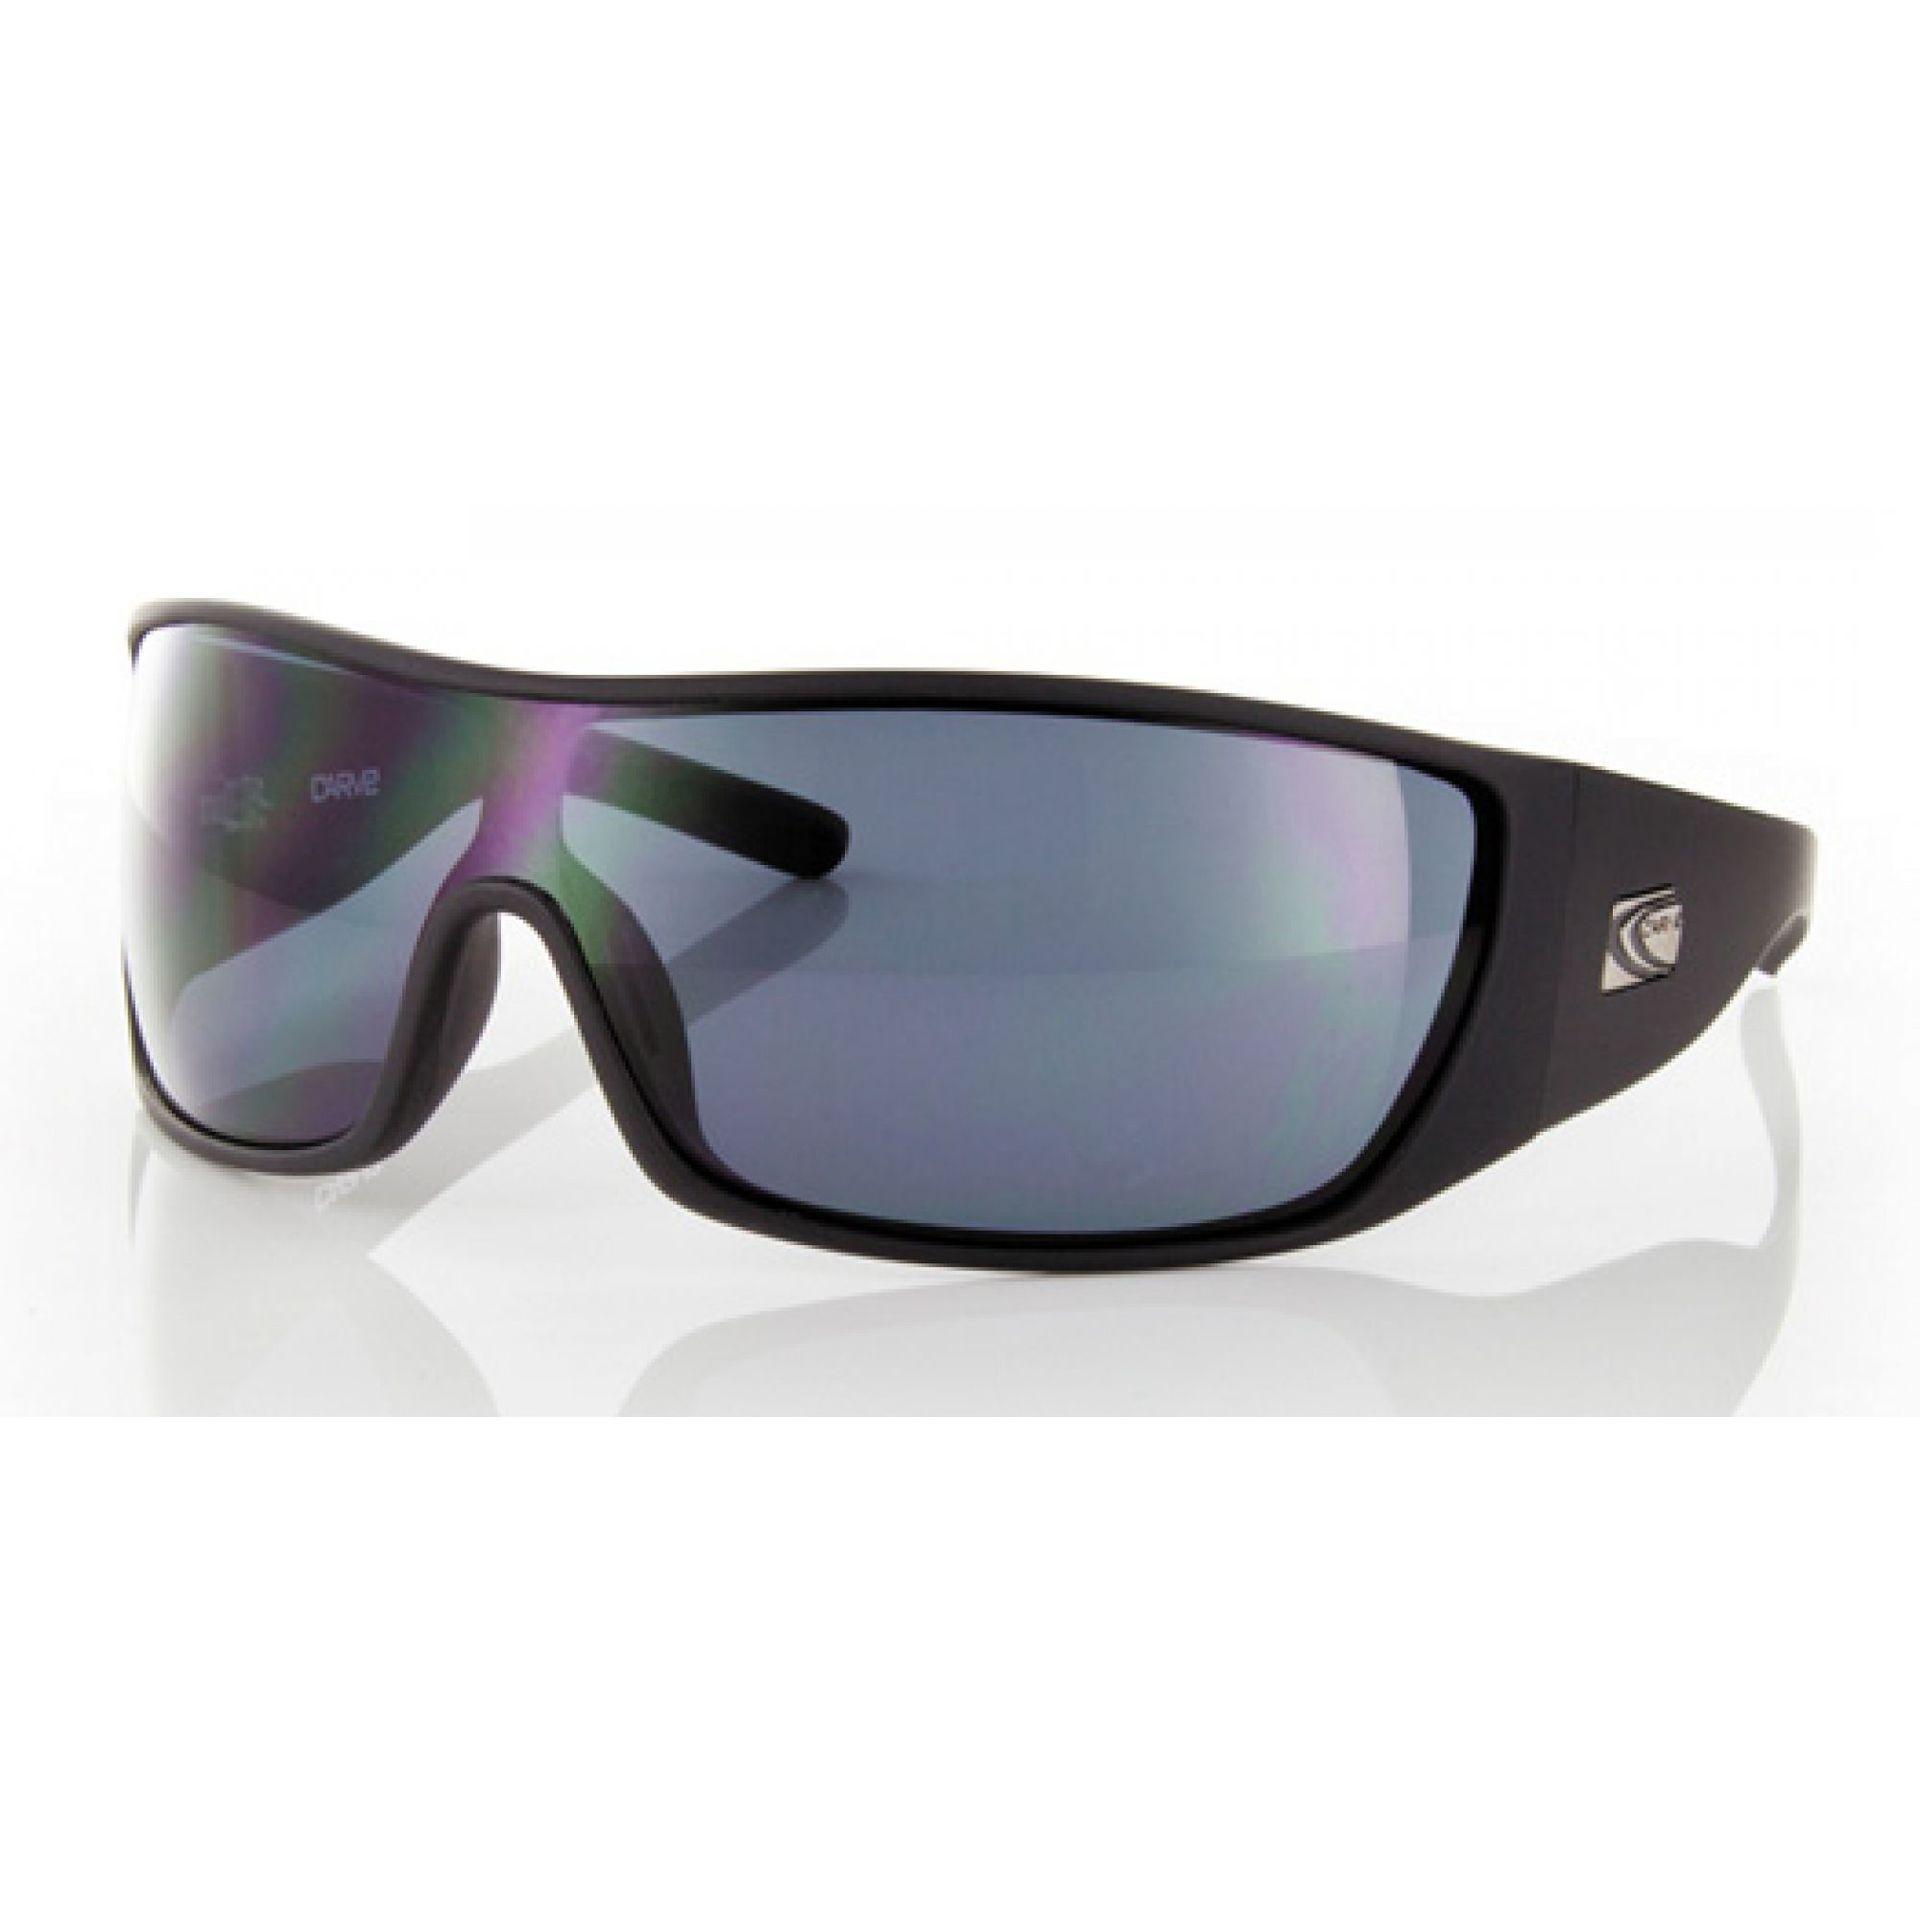 Okulary Carve Kingpin czarne